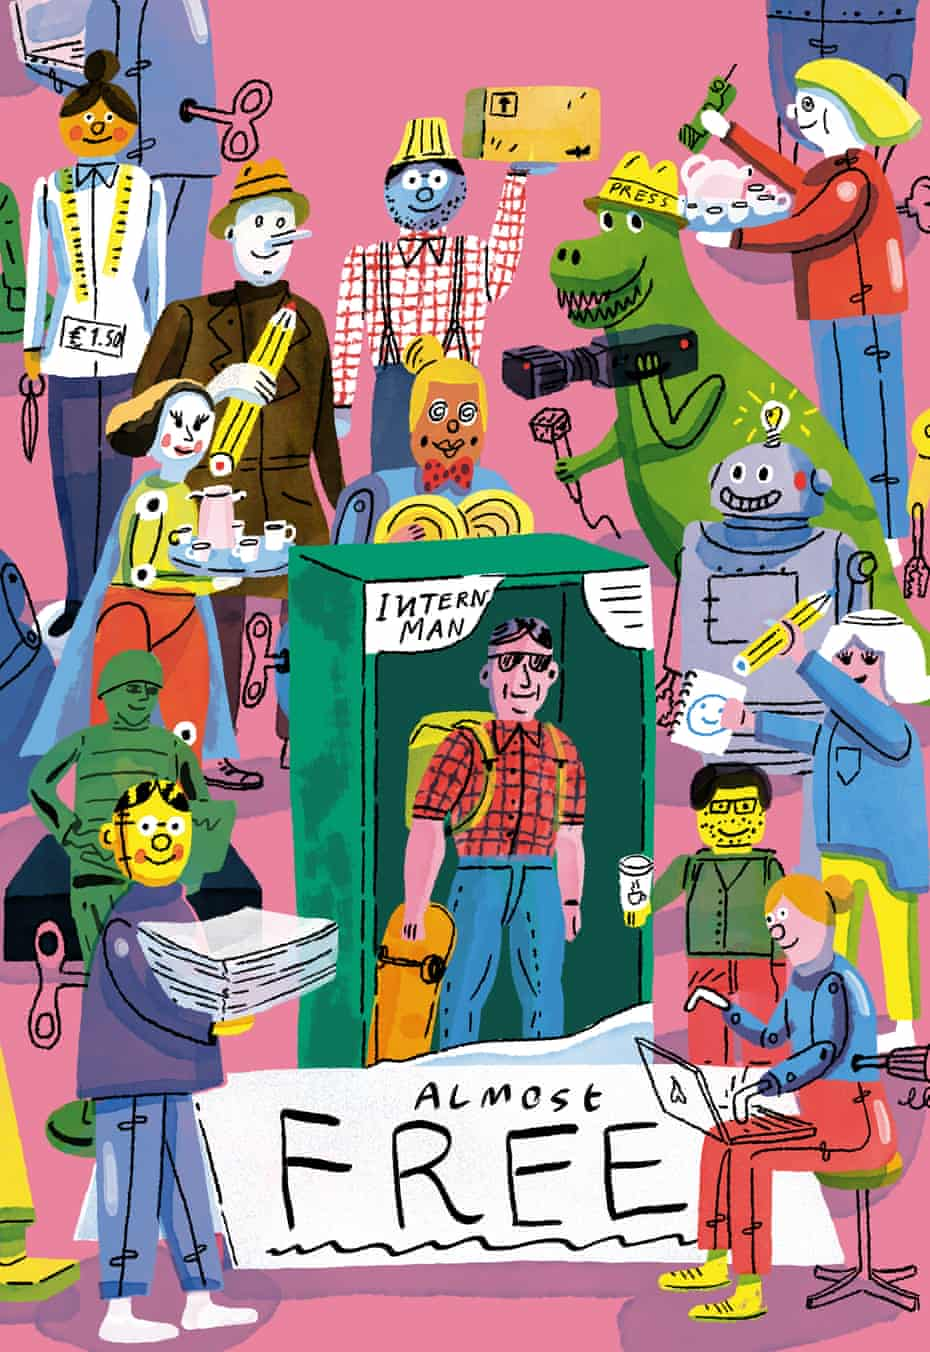 illustration for interns long read